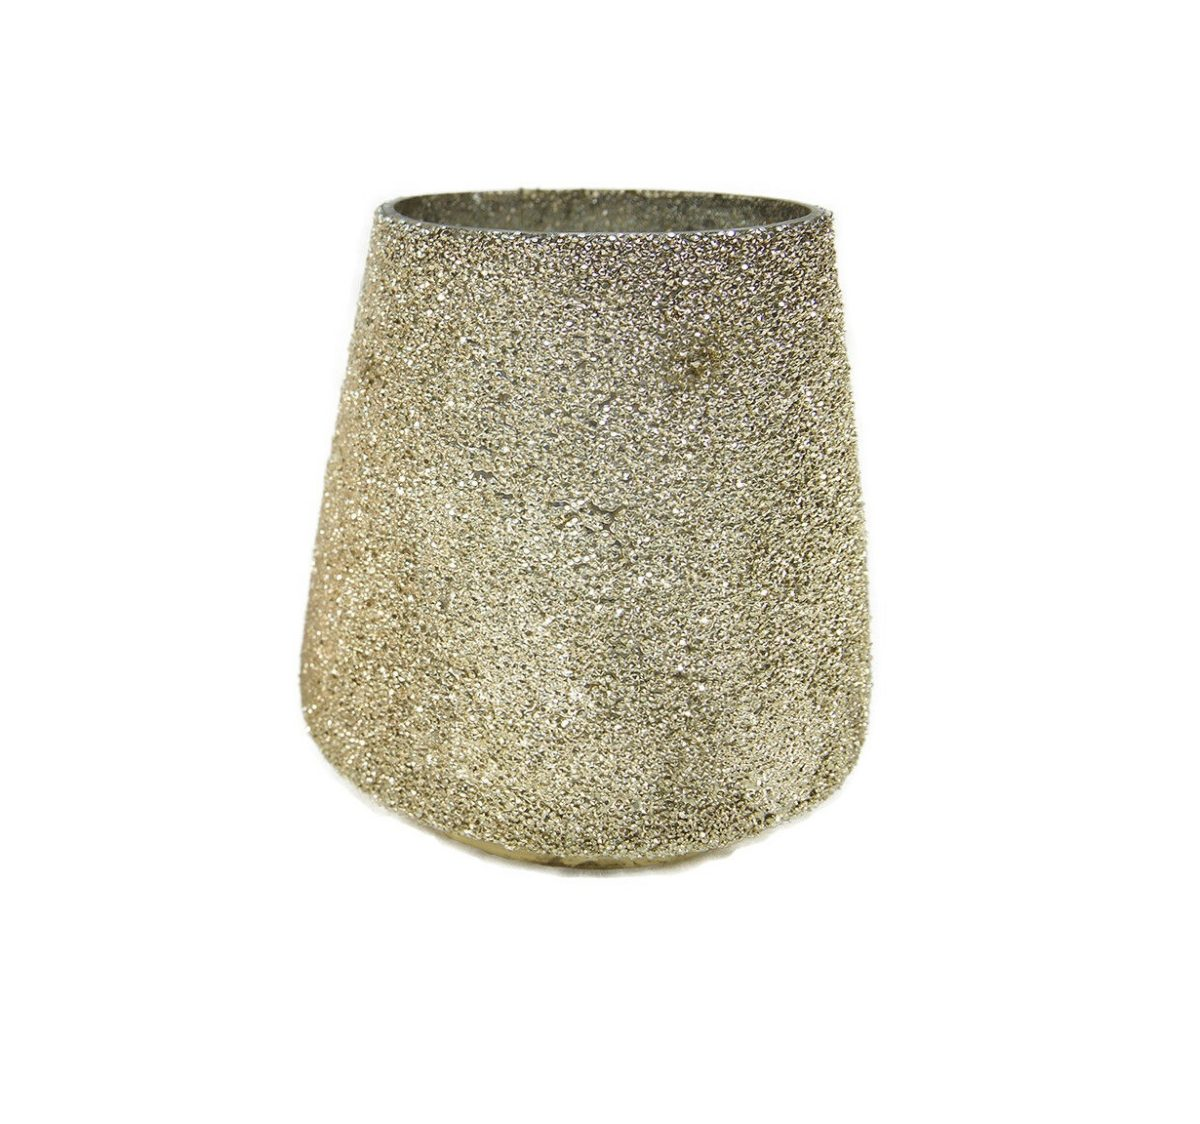 Windlicht Glas Kerzenglas Windlichtglas Tisch Deko rosa silber 2 1200x1124 - Suport pentru lumânări Filari 16 cm (1003379)